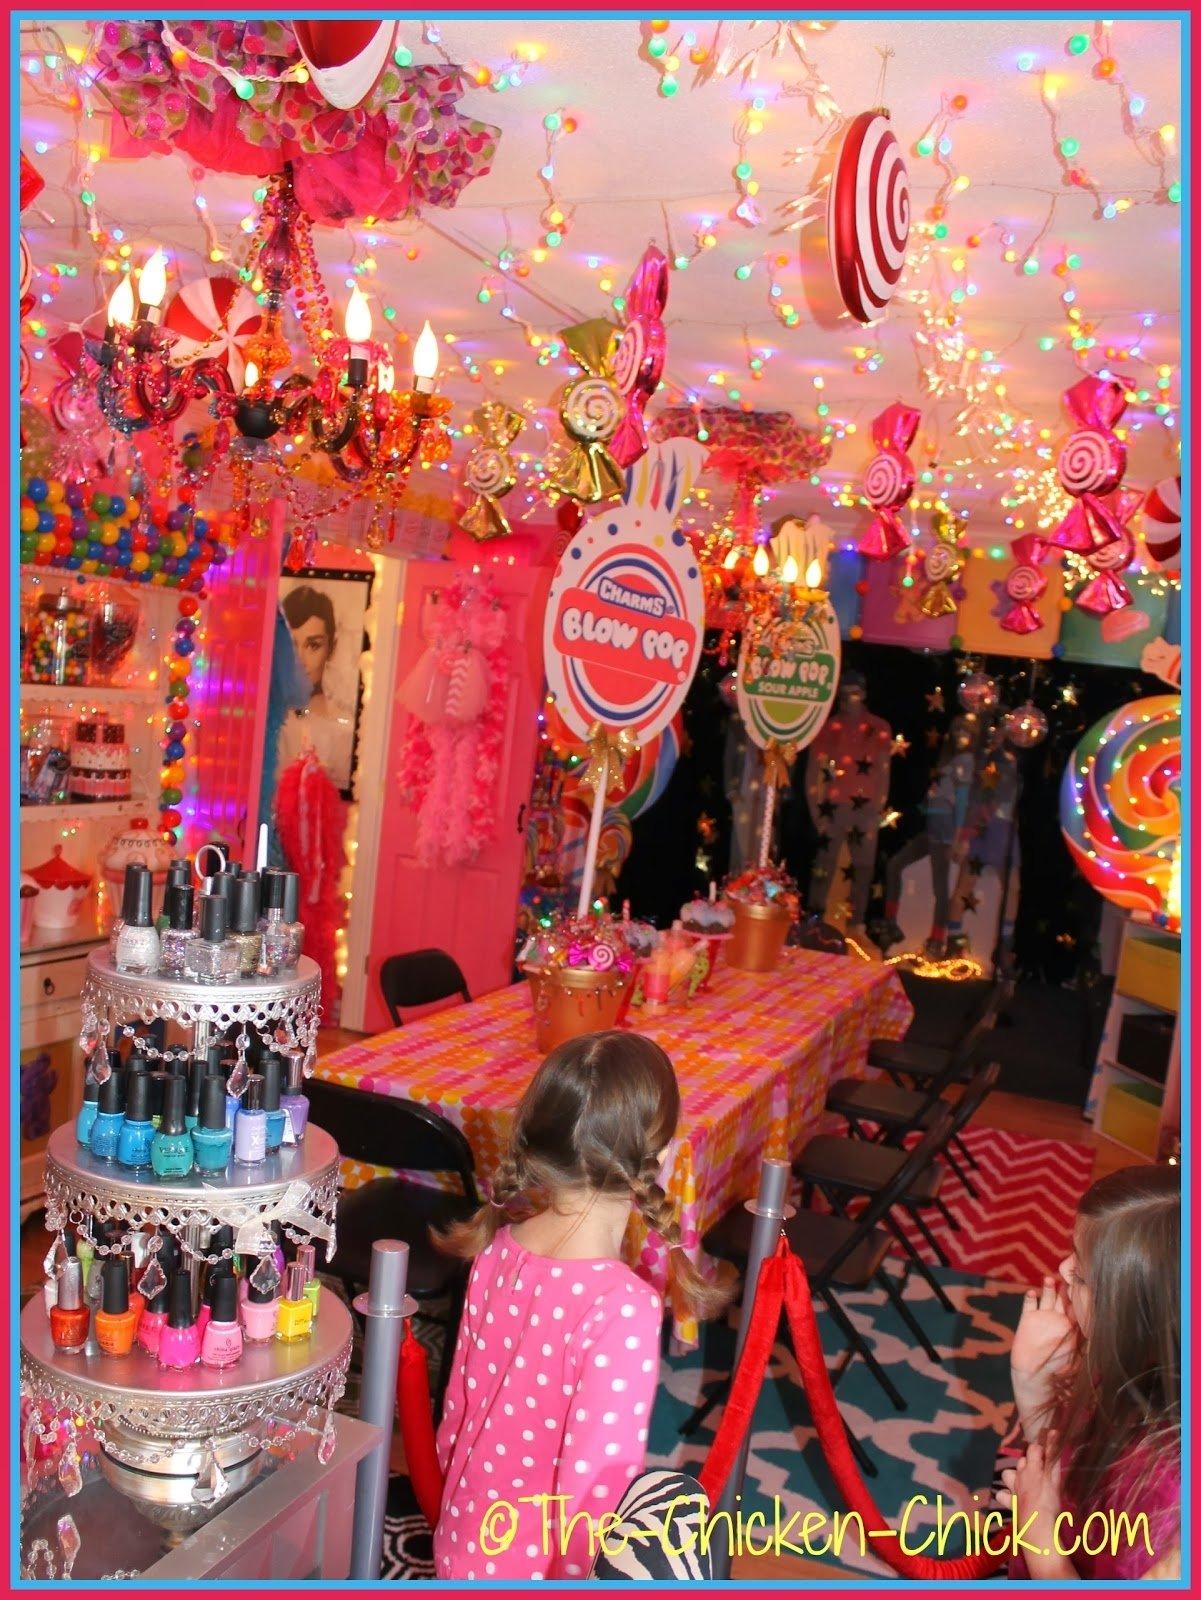 10 Stylish Birthday Ideas For 13 Year Old Girl spa birthday party ideas for 7 year olds pool design ideas 39 2020